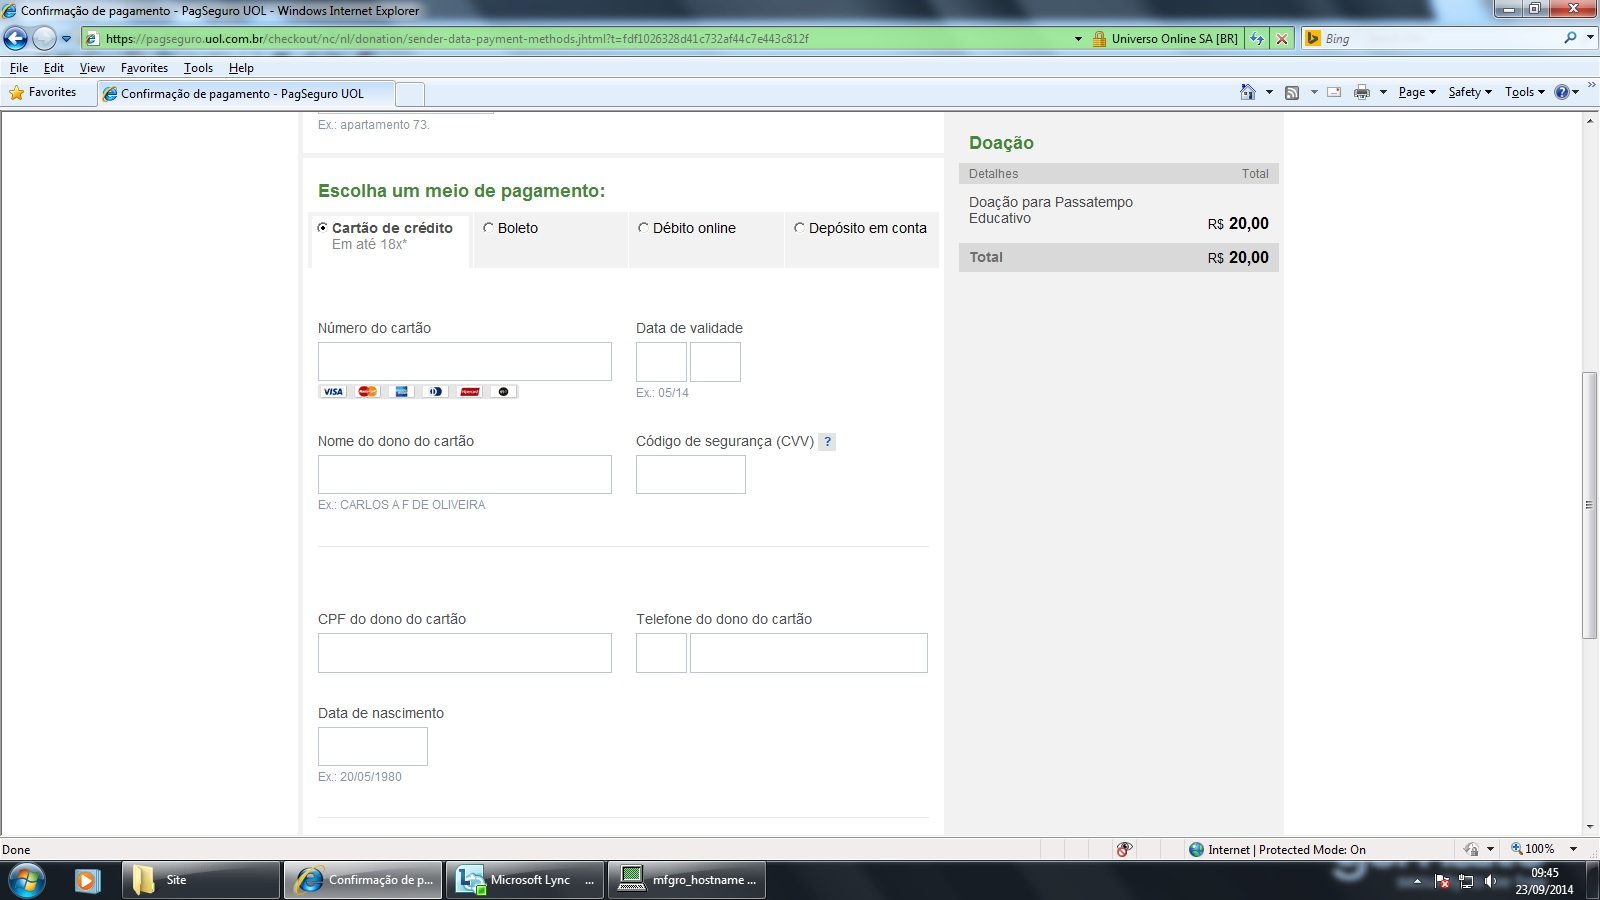 passatempoeducativo.org.br/attachments/Image/doacao-3_1.jpg?template=generic